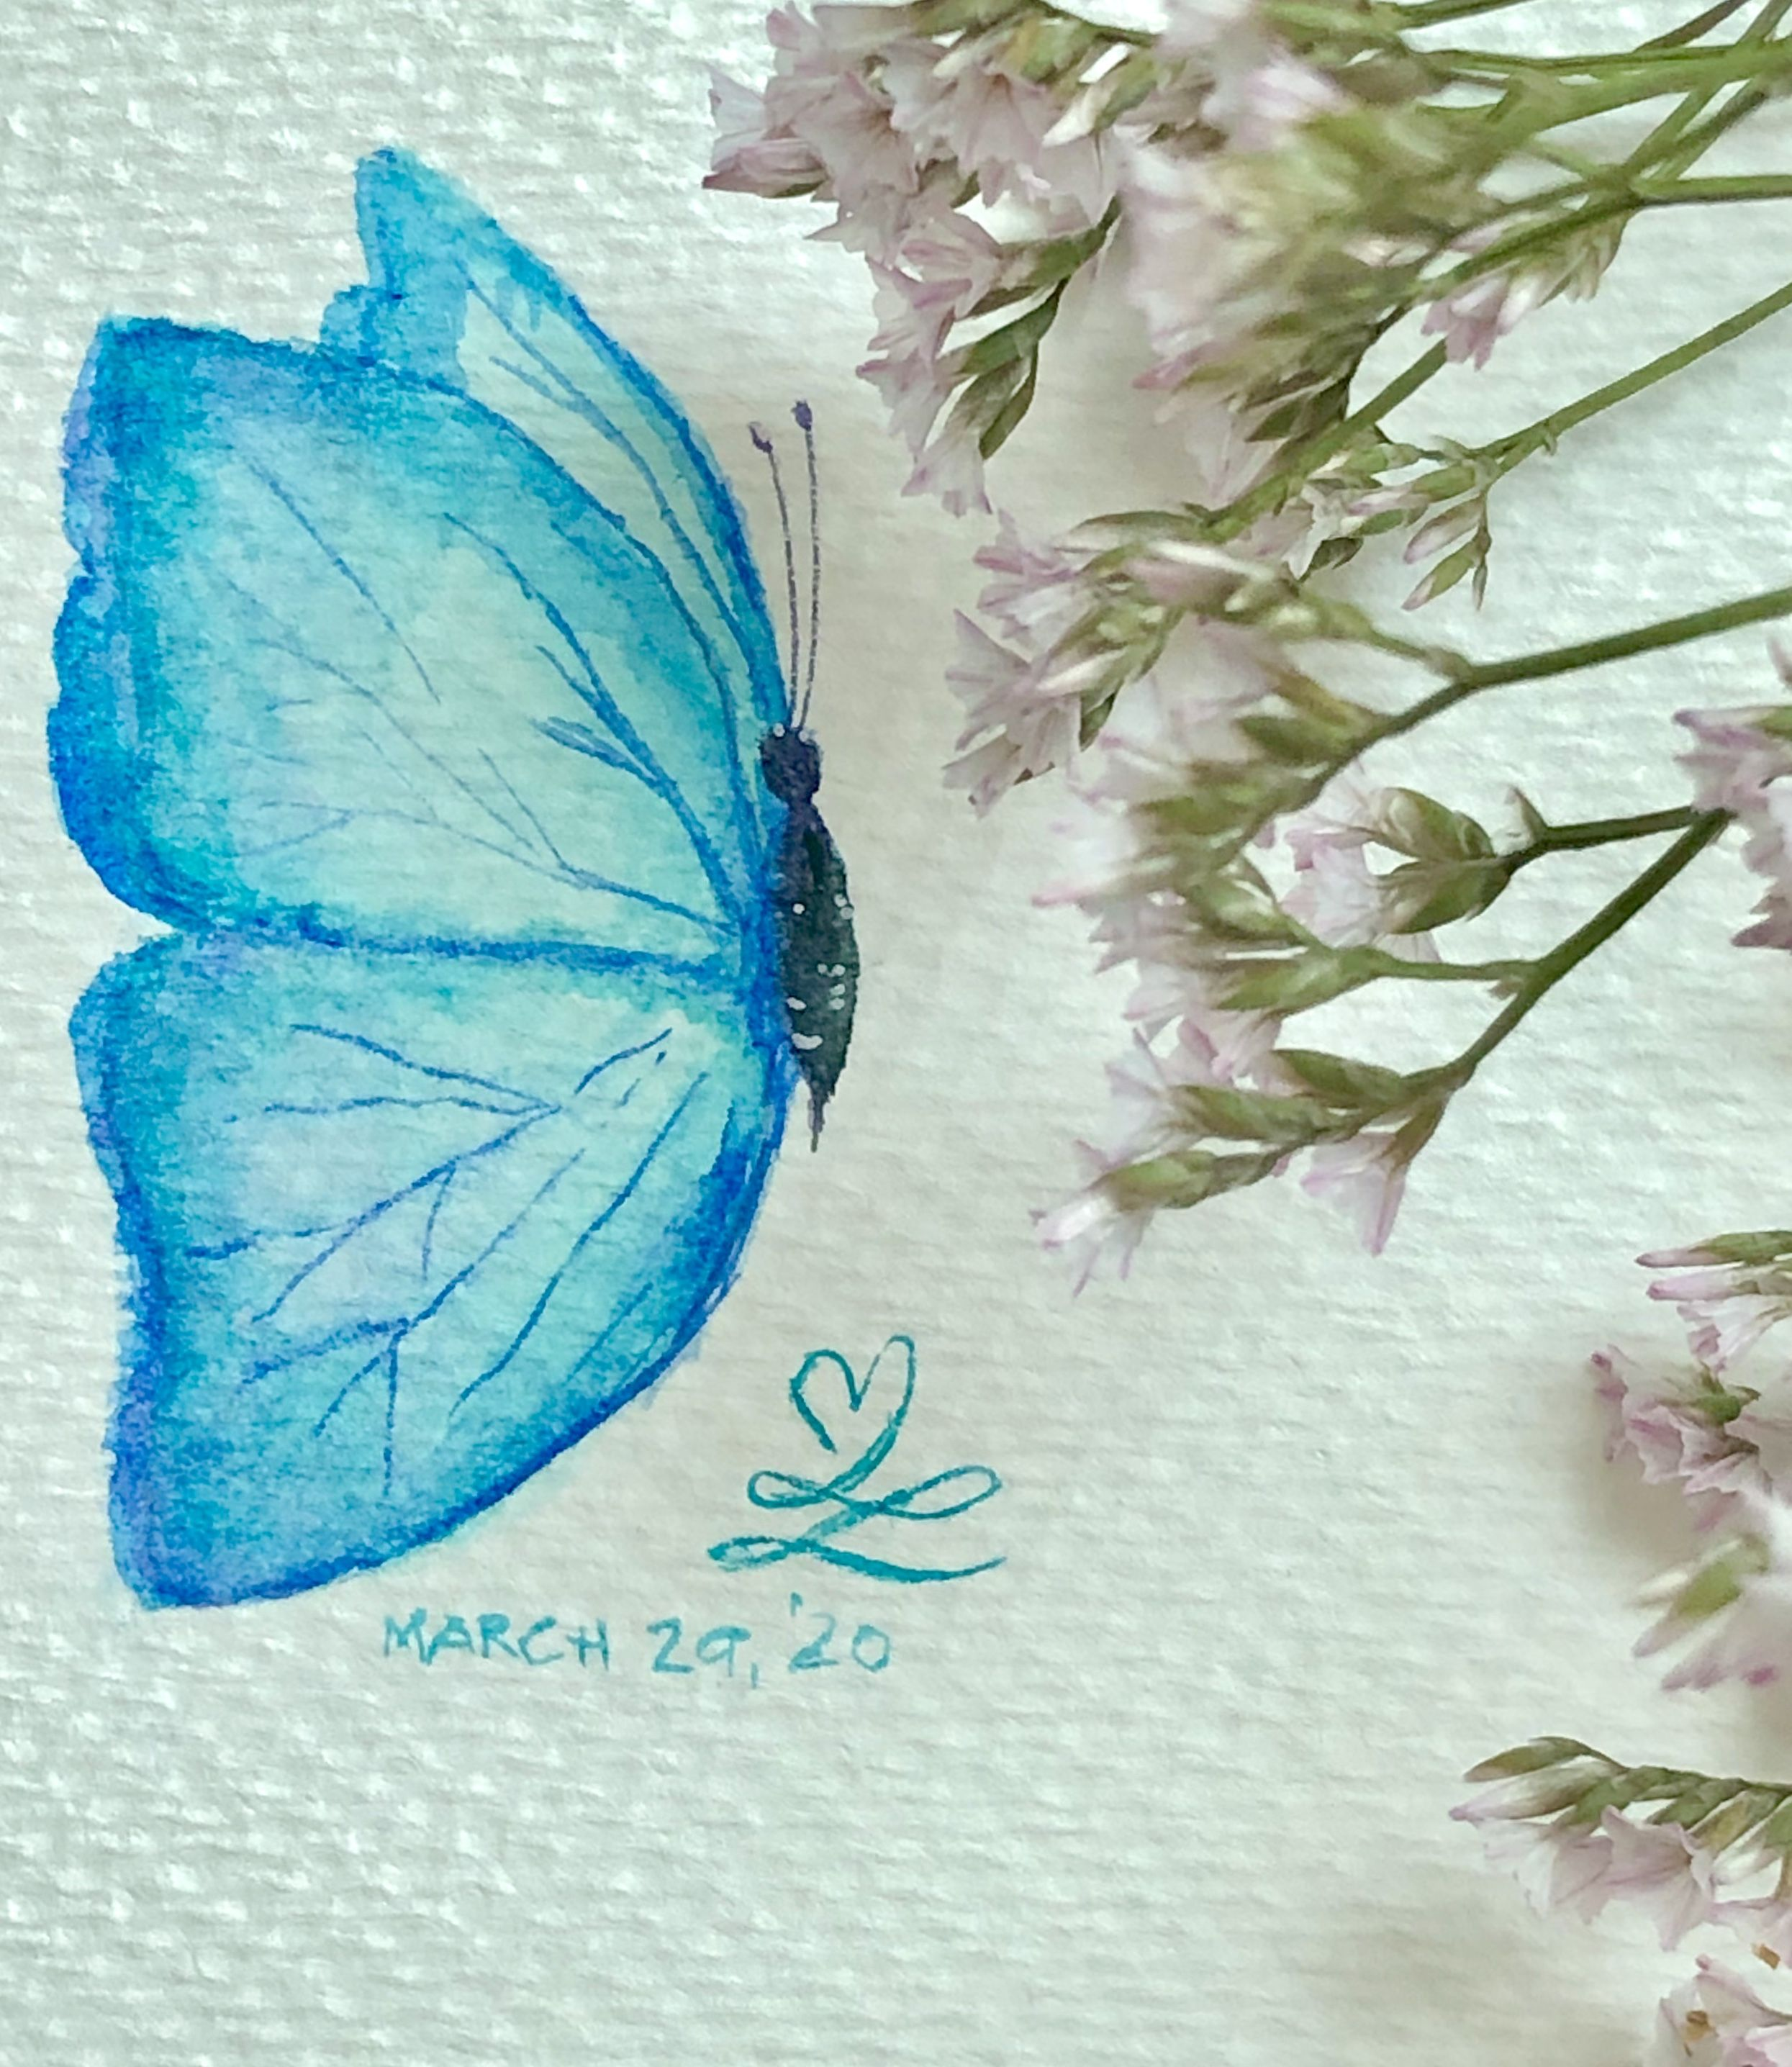 #butterfly #watercolor #prang #montmartre  #painting  #art  #mindfulness #drawing #watercolorpainting   #pencil #fabercastell  #derwentpastel #sketch #staedtler  #derwentinktense #winsorandnewton #koi #kuretakezig